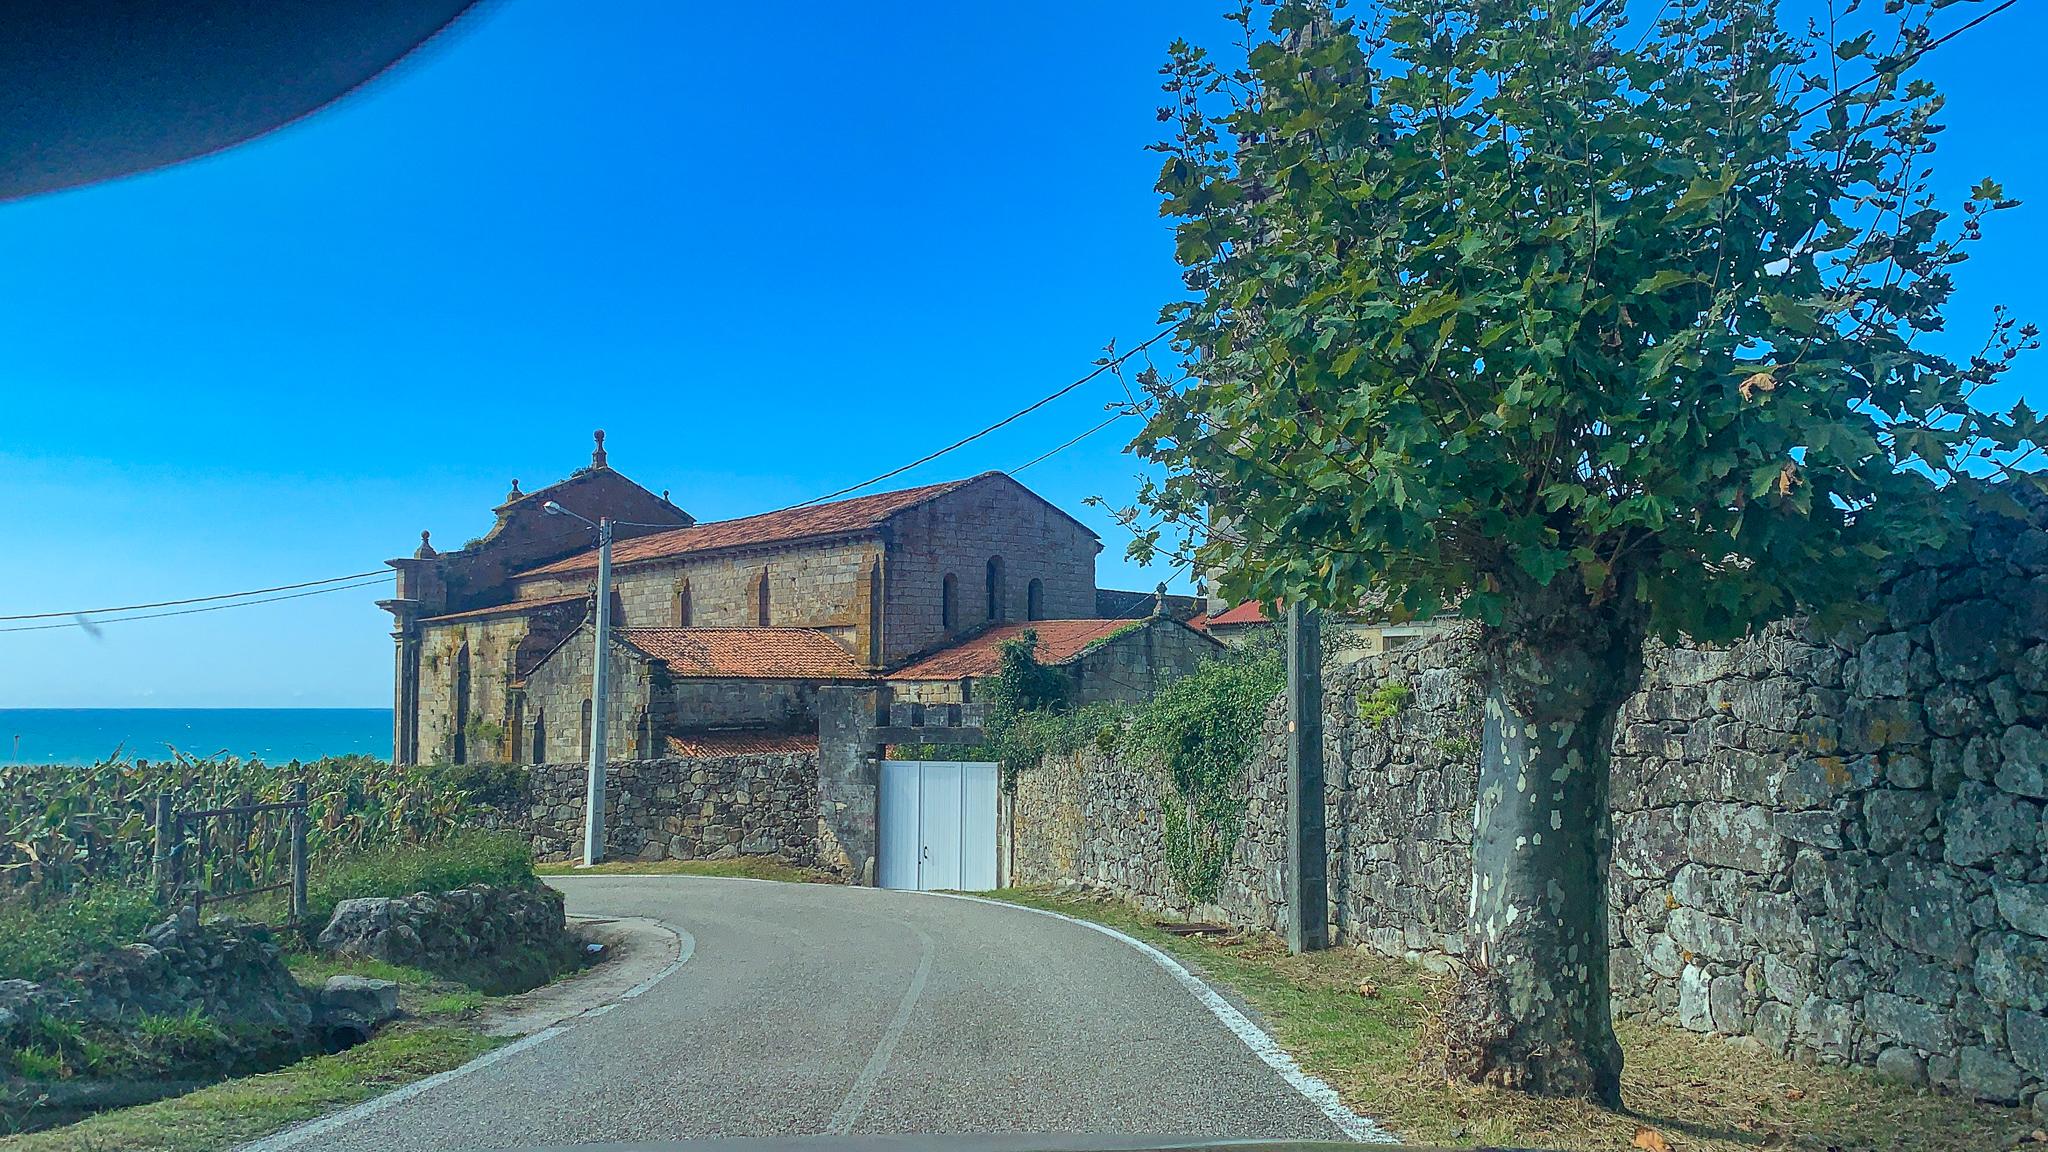 Monasterio Oia Pontevedra